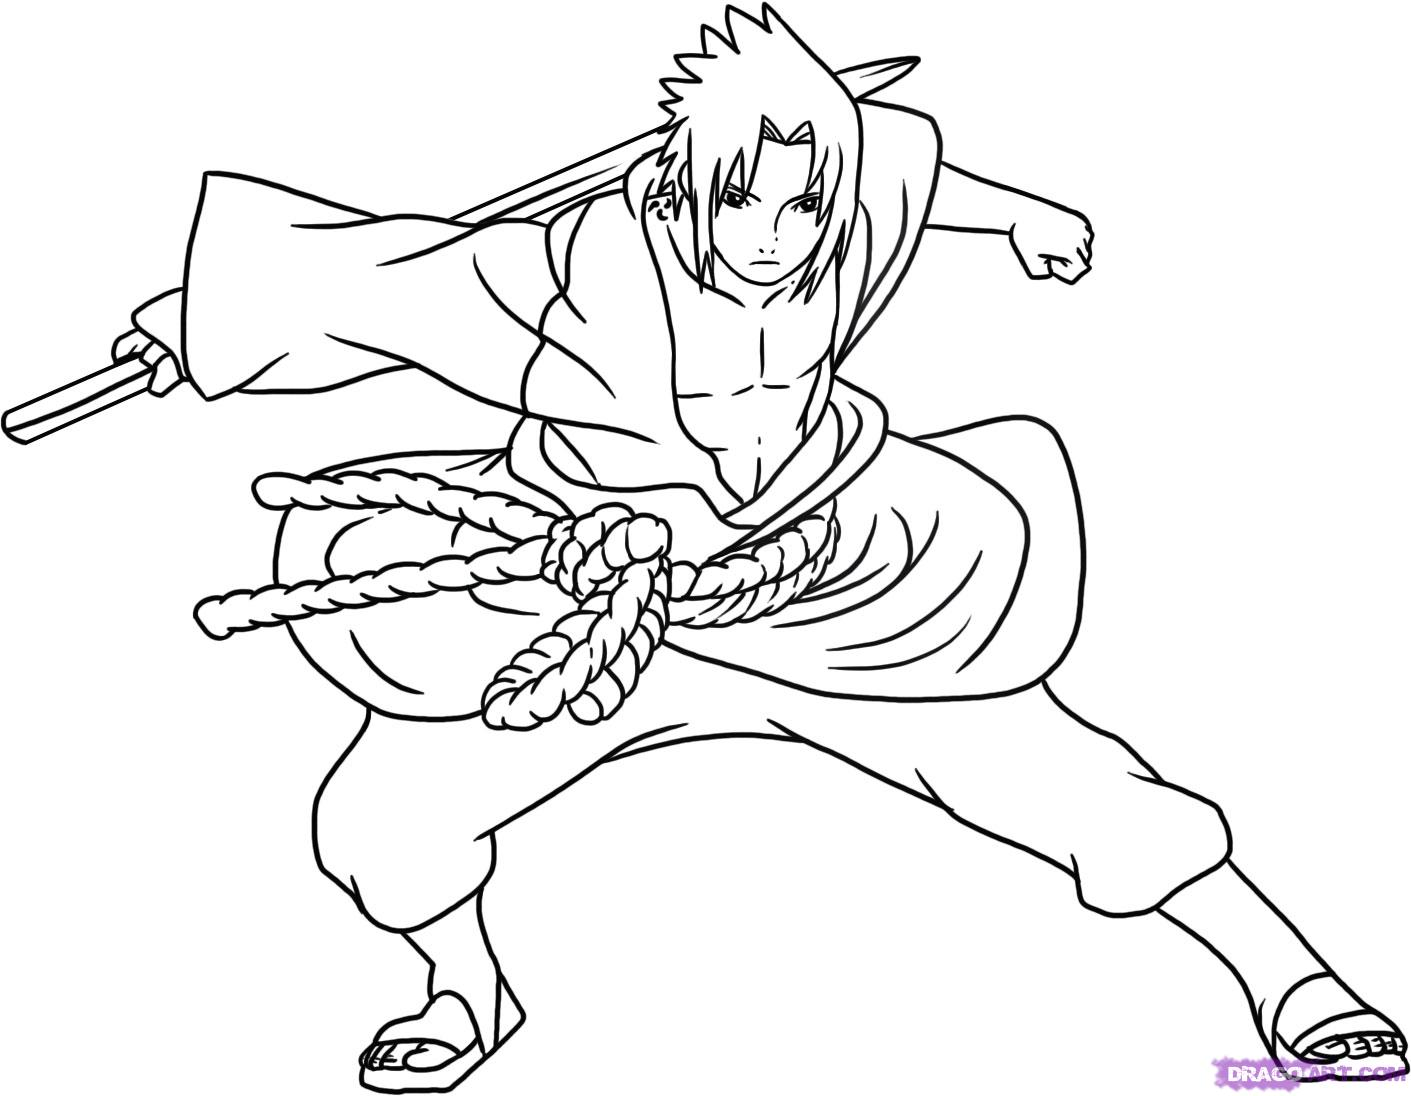 Drawn pice sasuke How Naruto Shippuden Characters Step